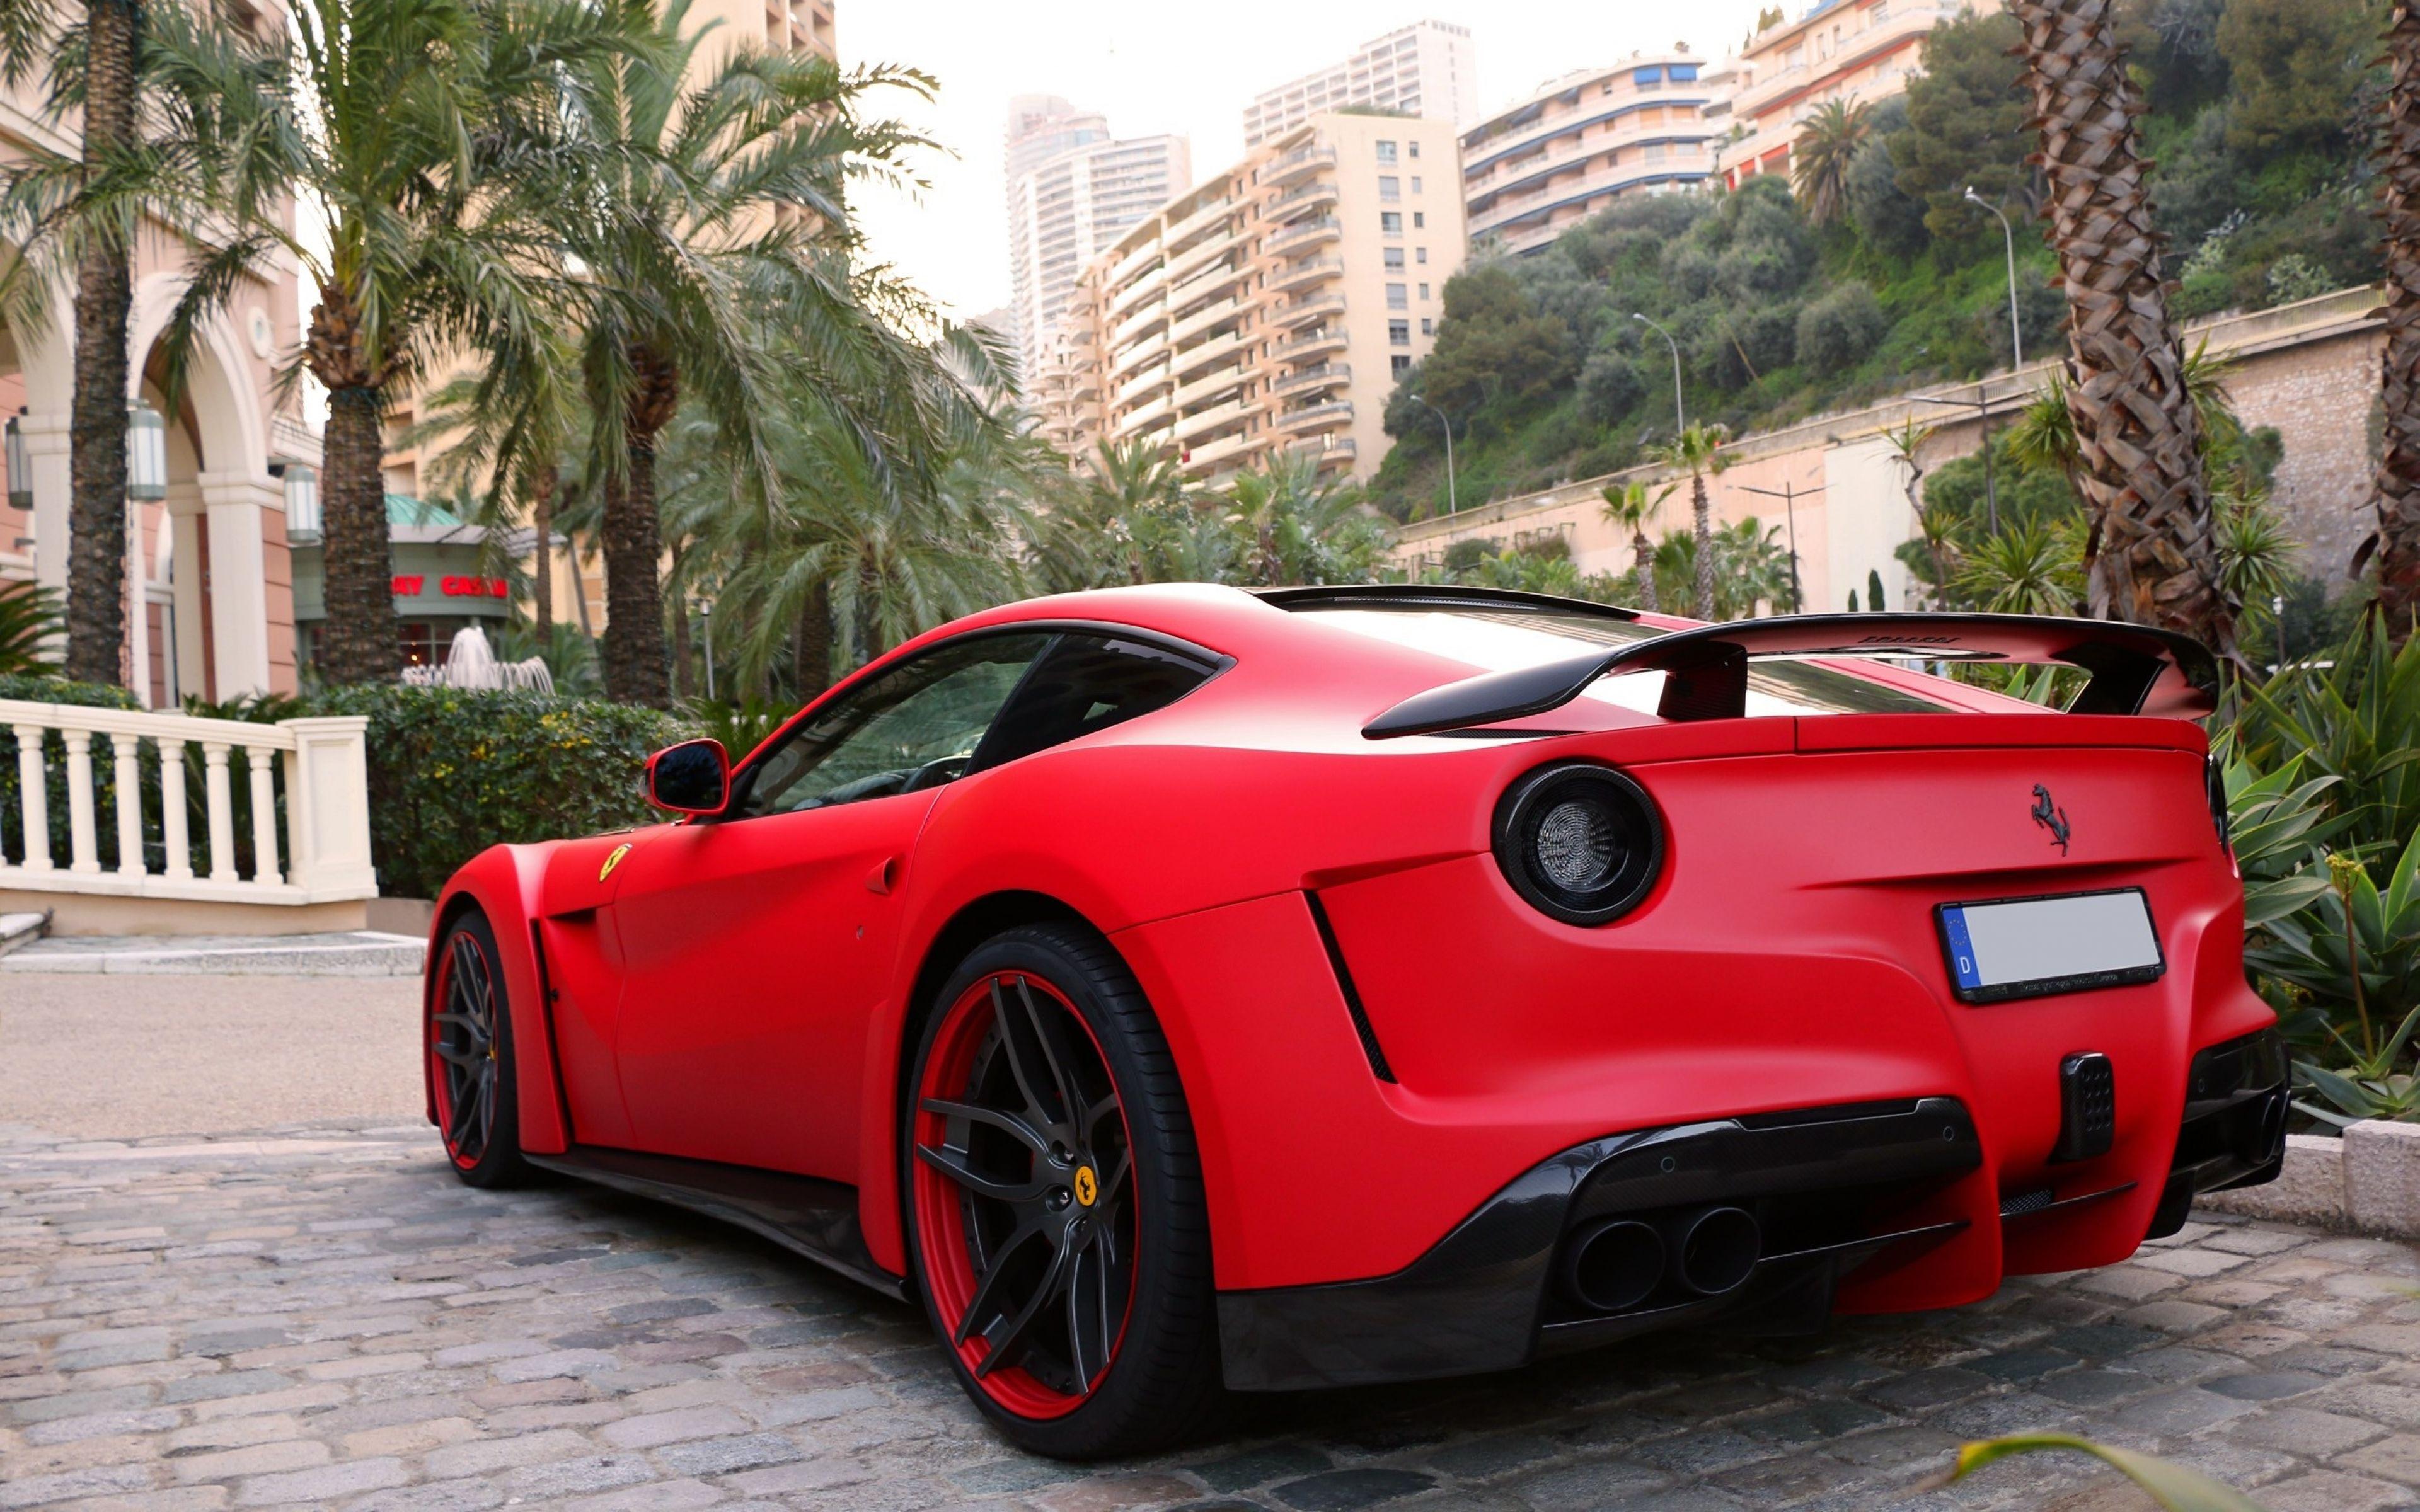 61eeb716639576effcedf570bb829461 Elegant Ferrari F 108 Al-mondial 8 Cars Trend